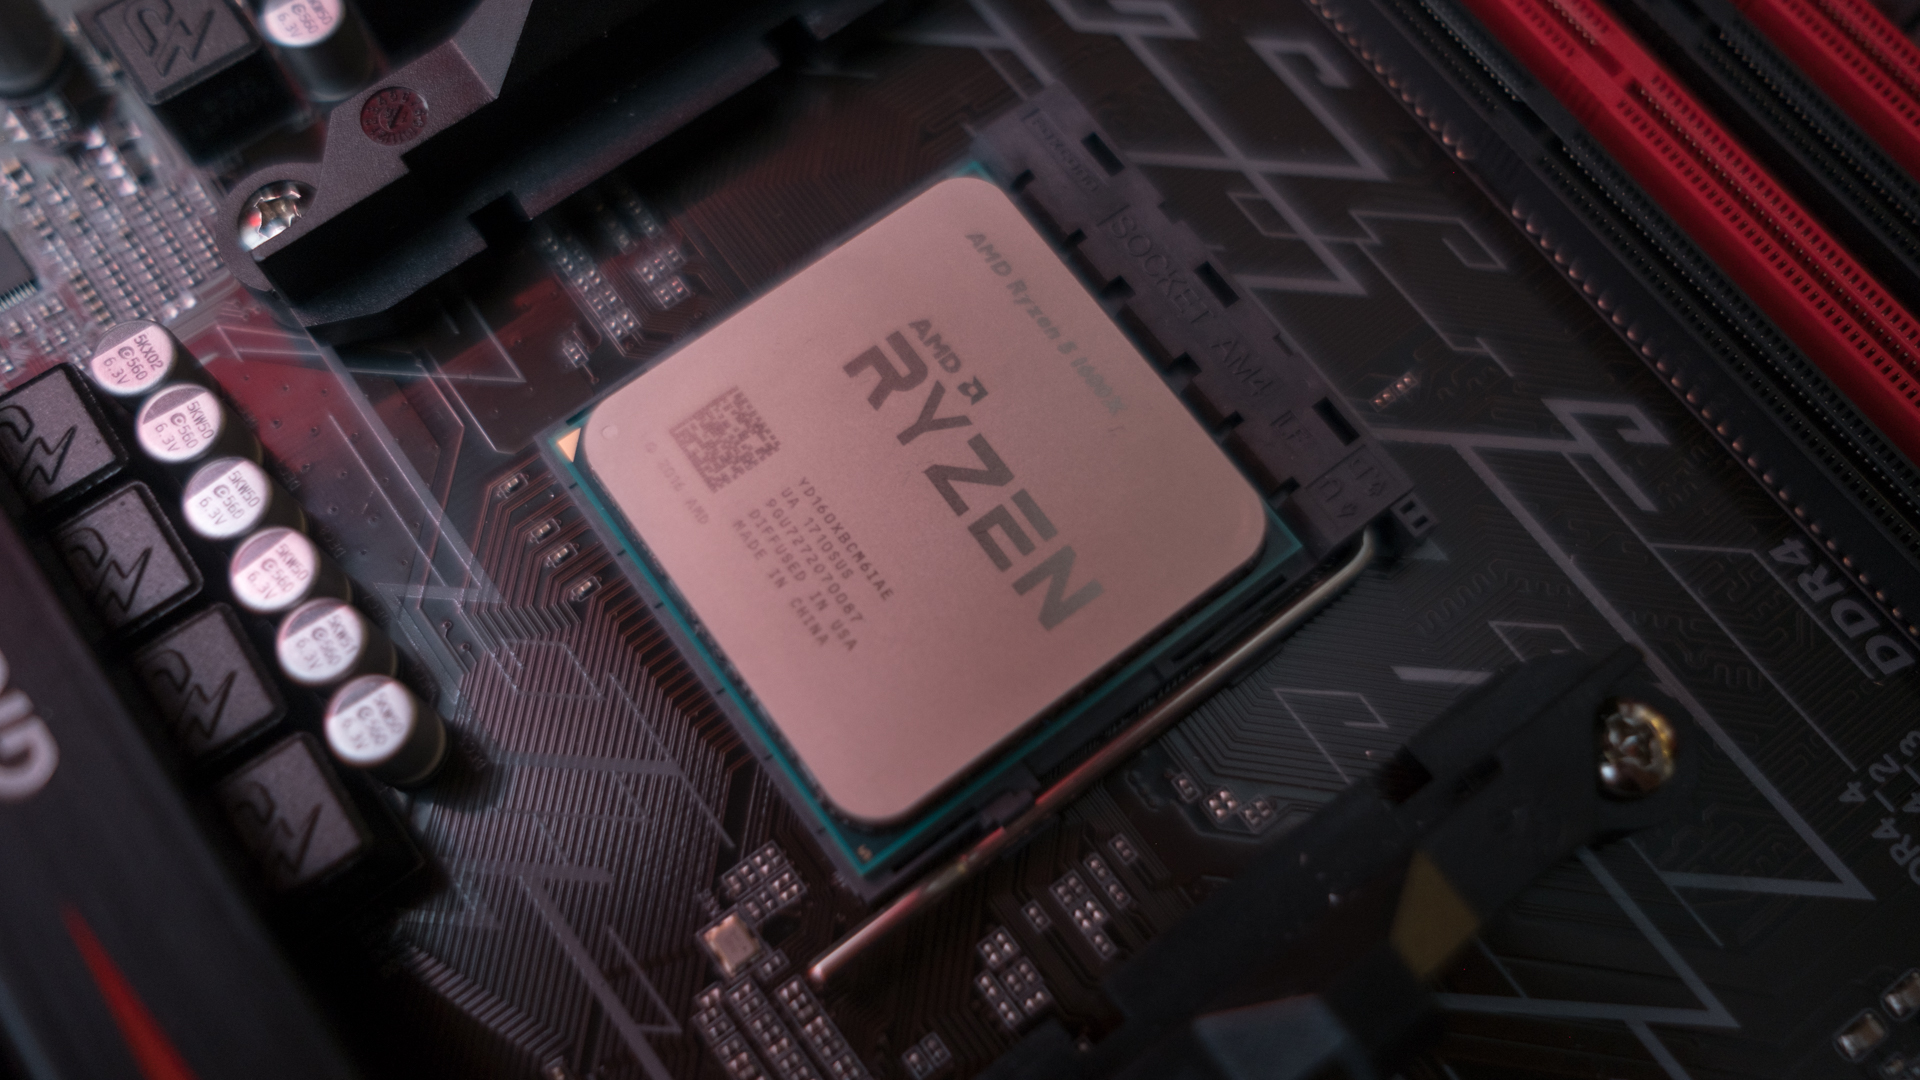 Amd Ryzen 5 1600x Review Techradar